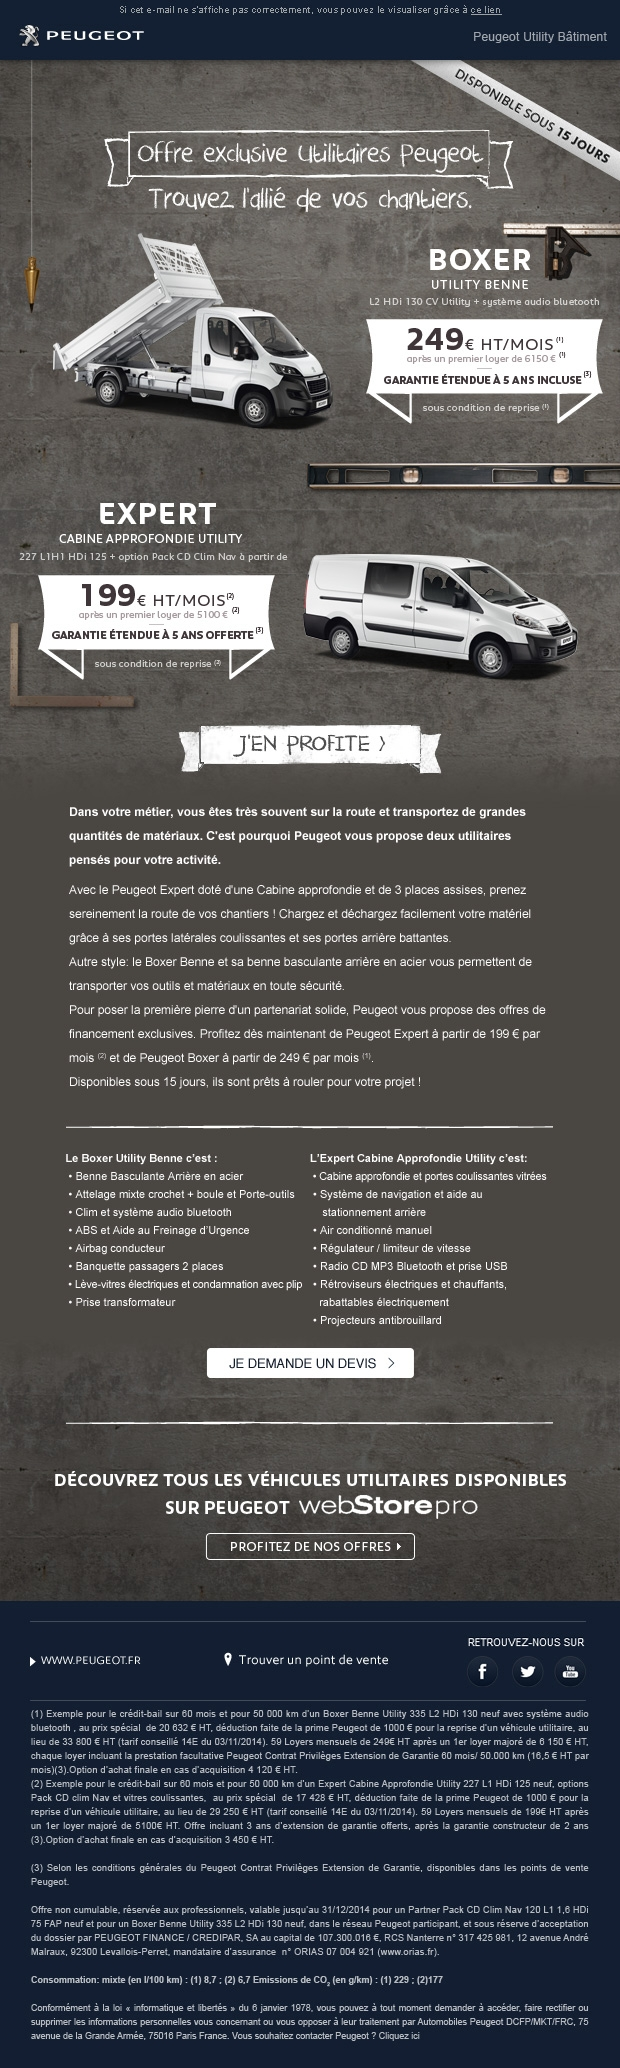 Emailing Peugeot